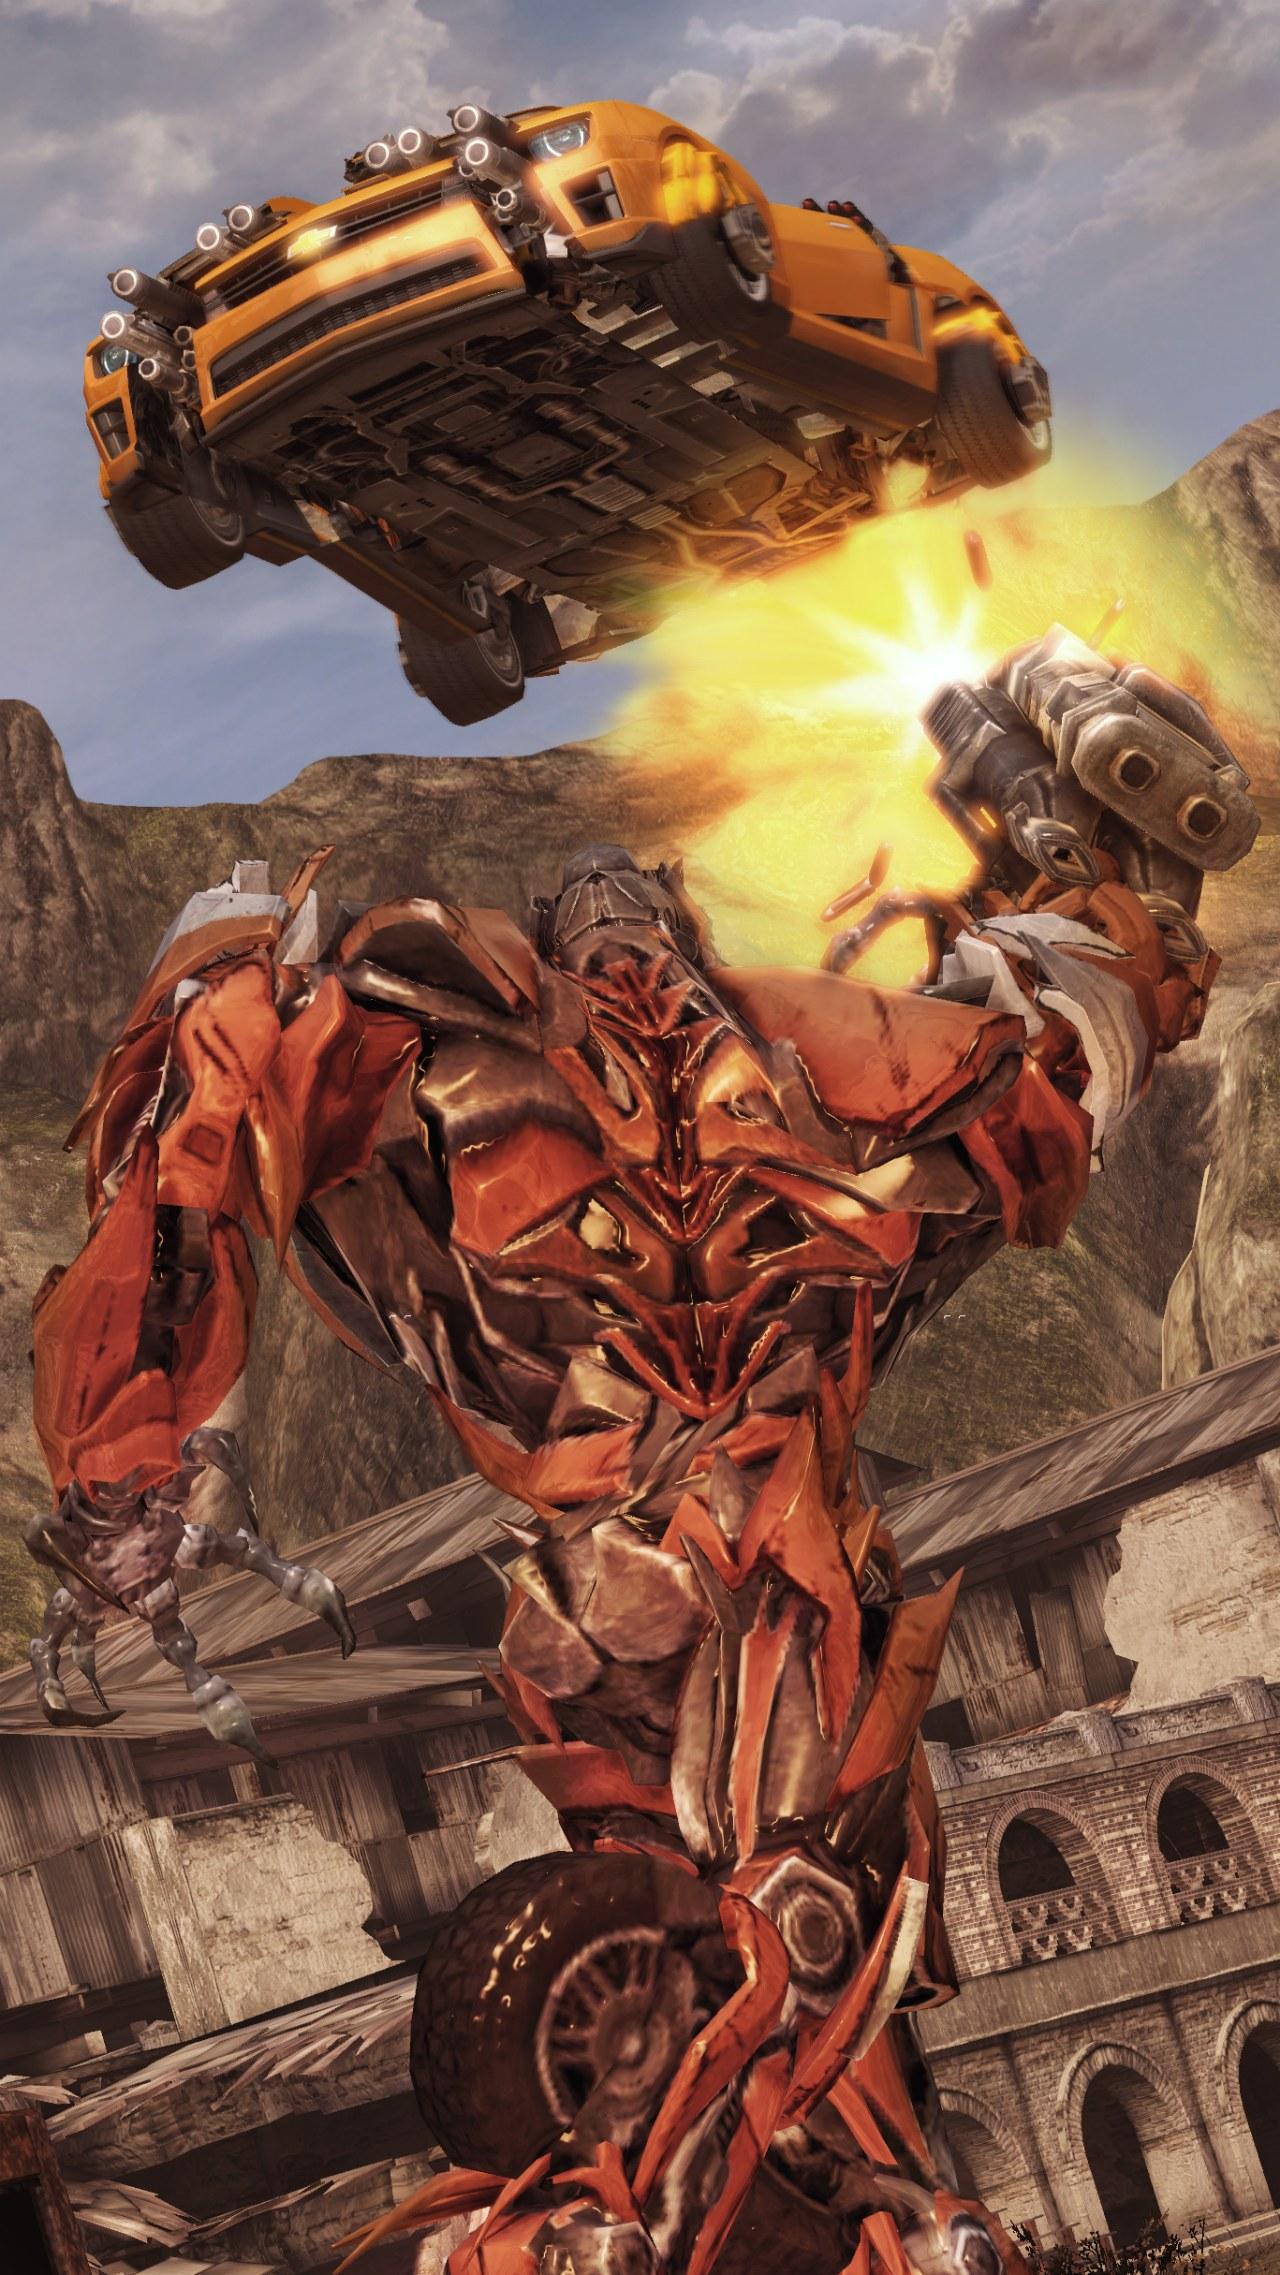 Obrázky z Transformers: Dark of the Moon 39576